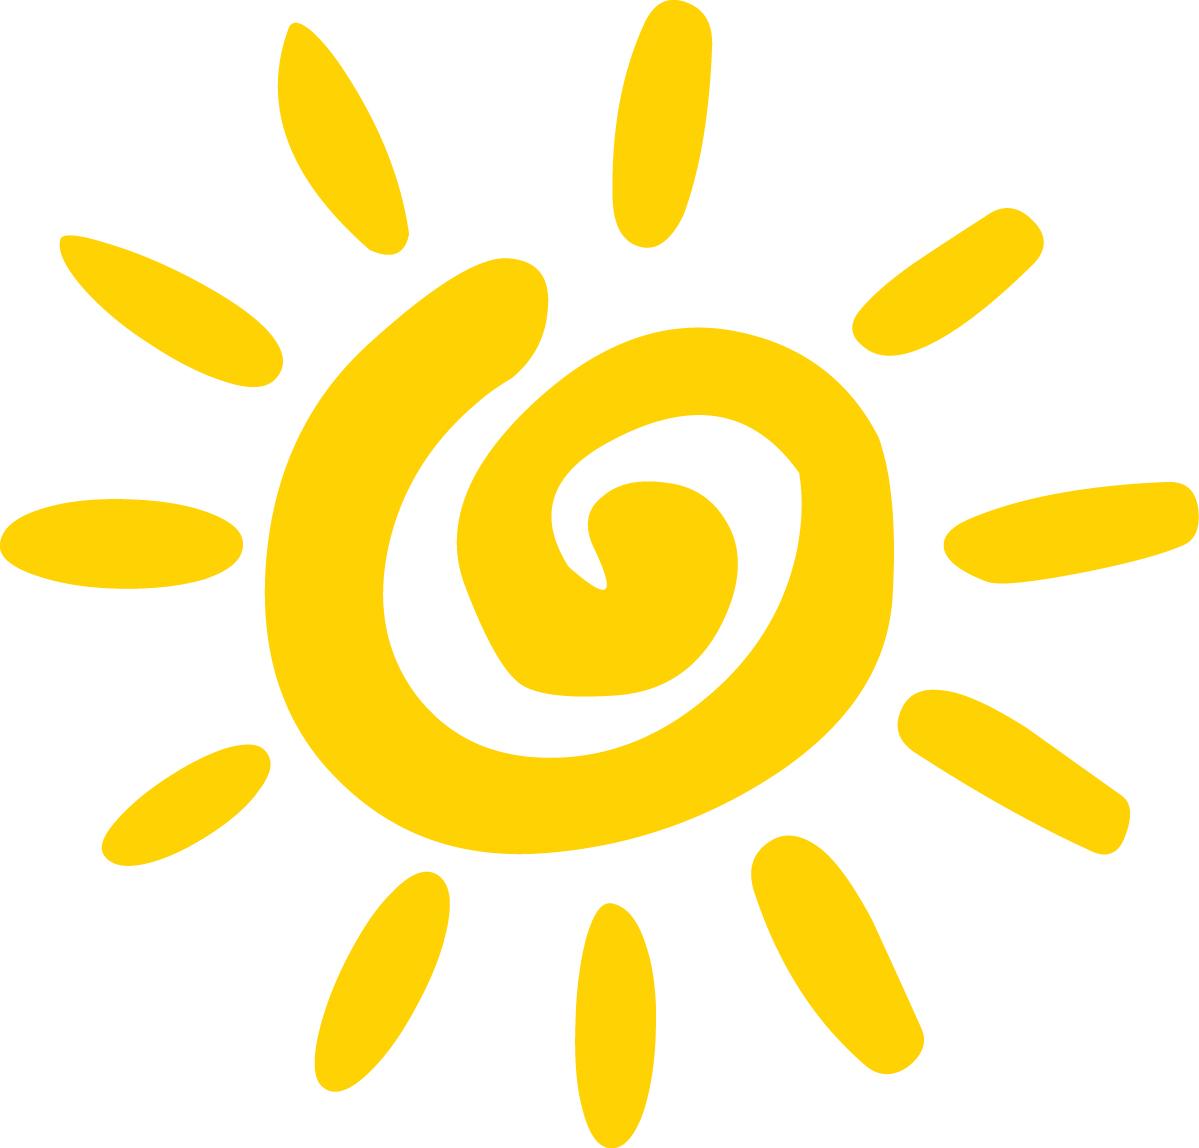 Summer Fun Clip Art - Clipart Library-Summer Fun Clip Art - Clipart library-10